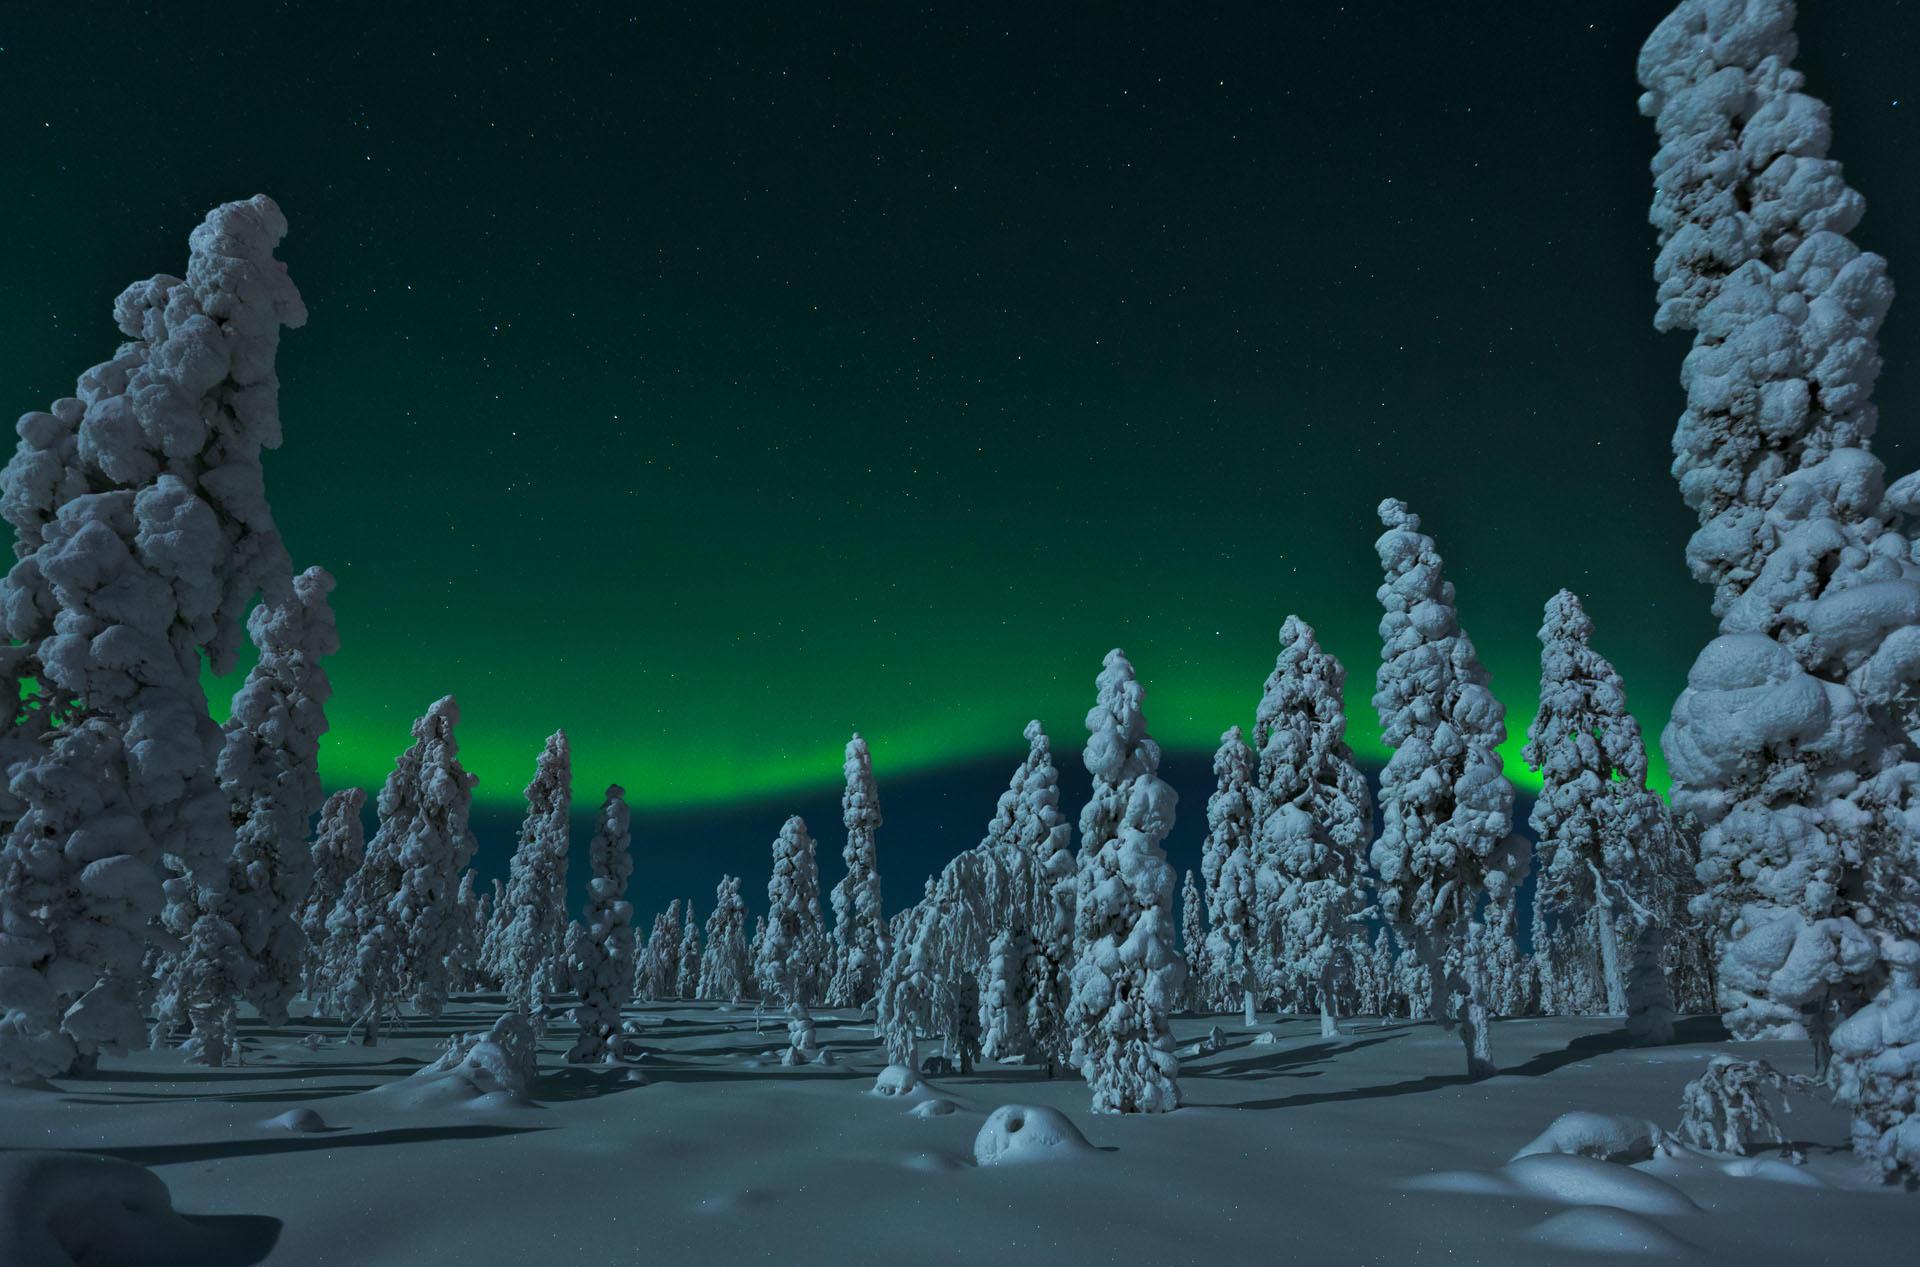 Attractions near Arctic Light Hotel in Rovaniemi, Finland